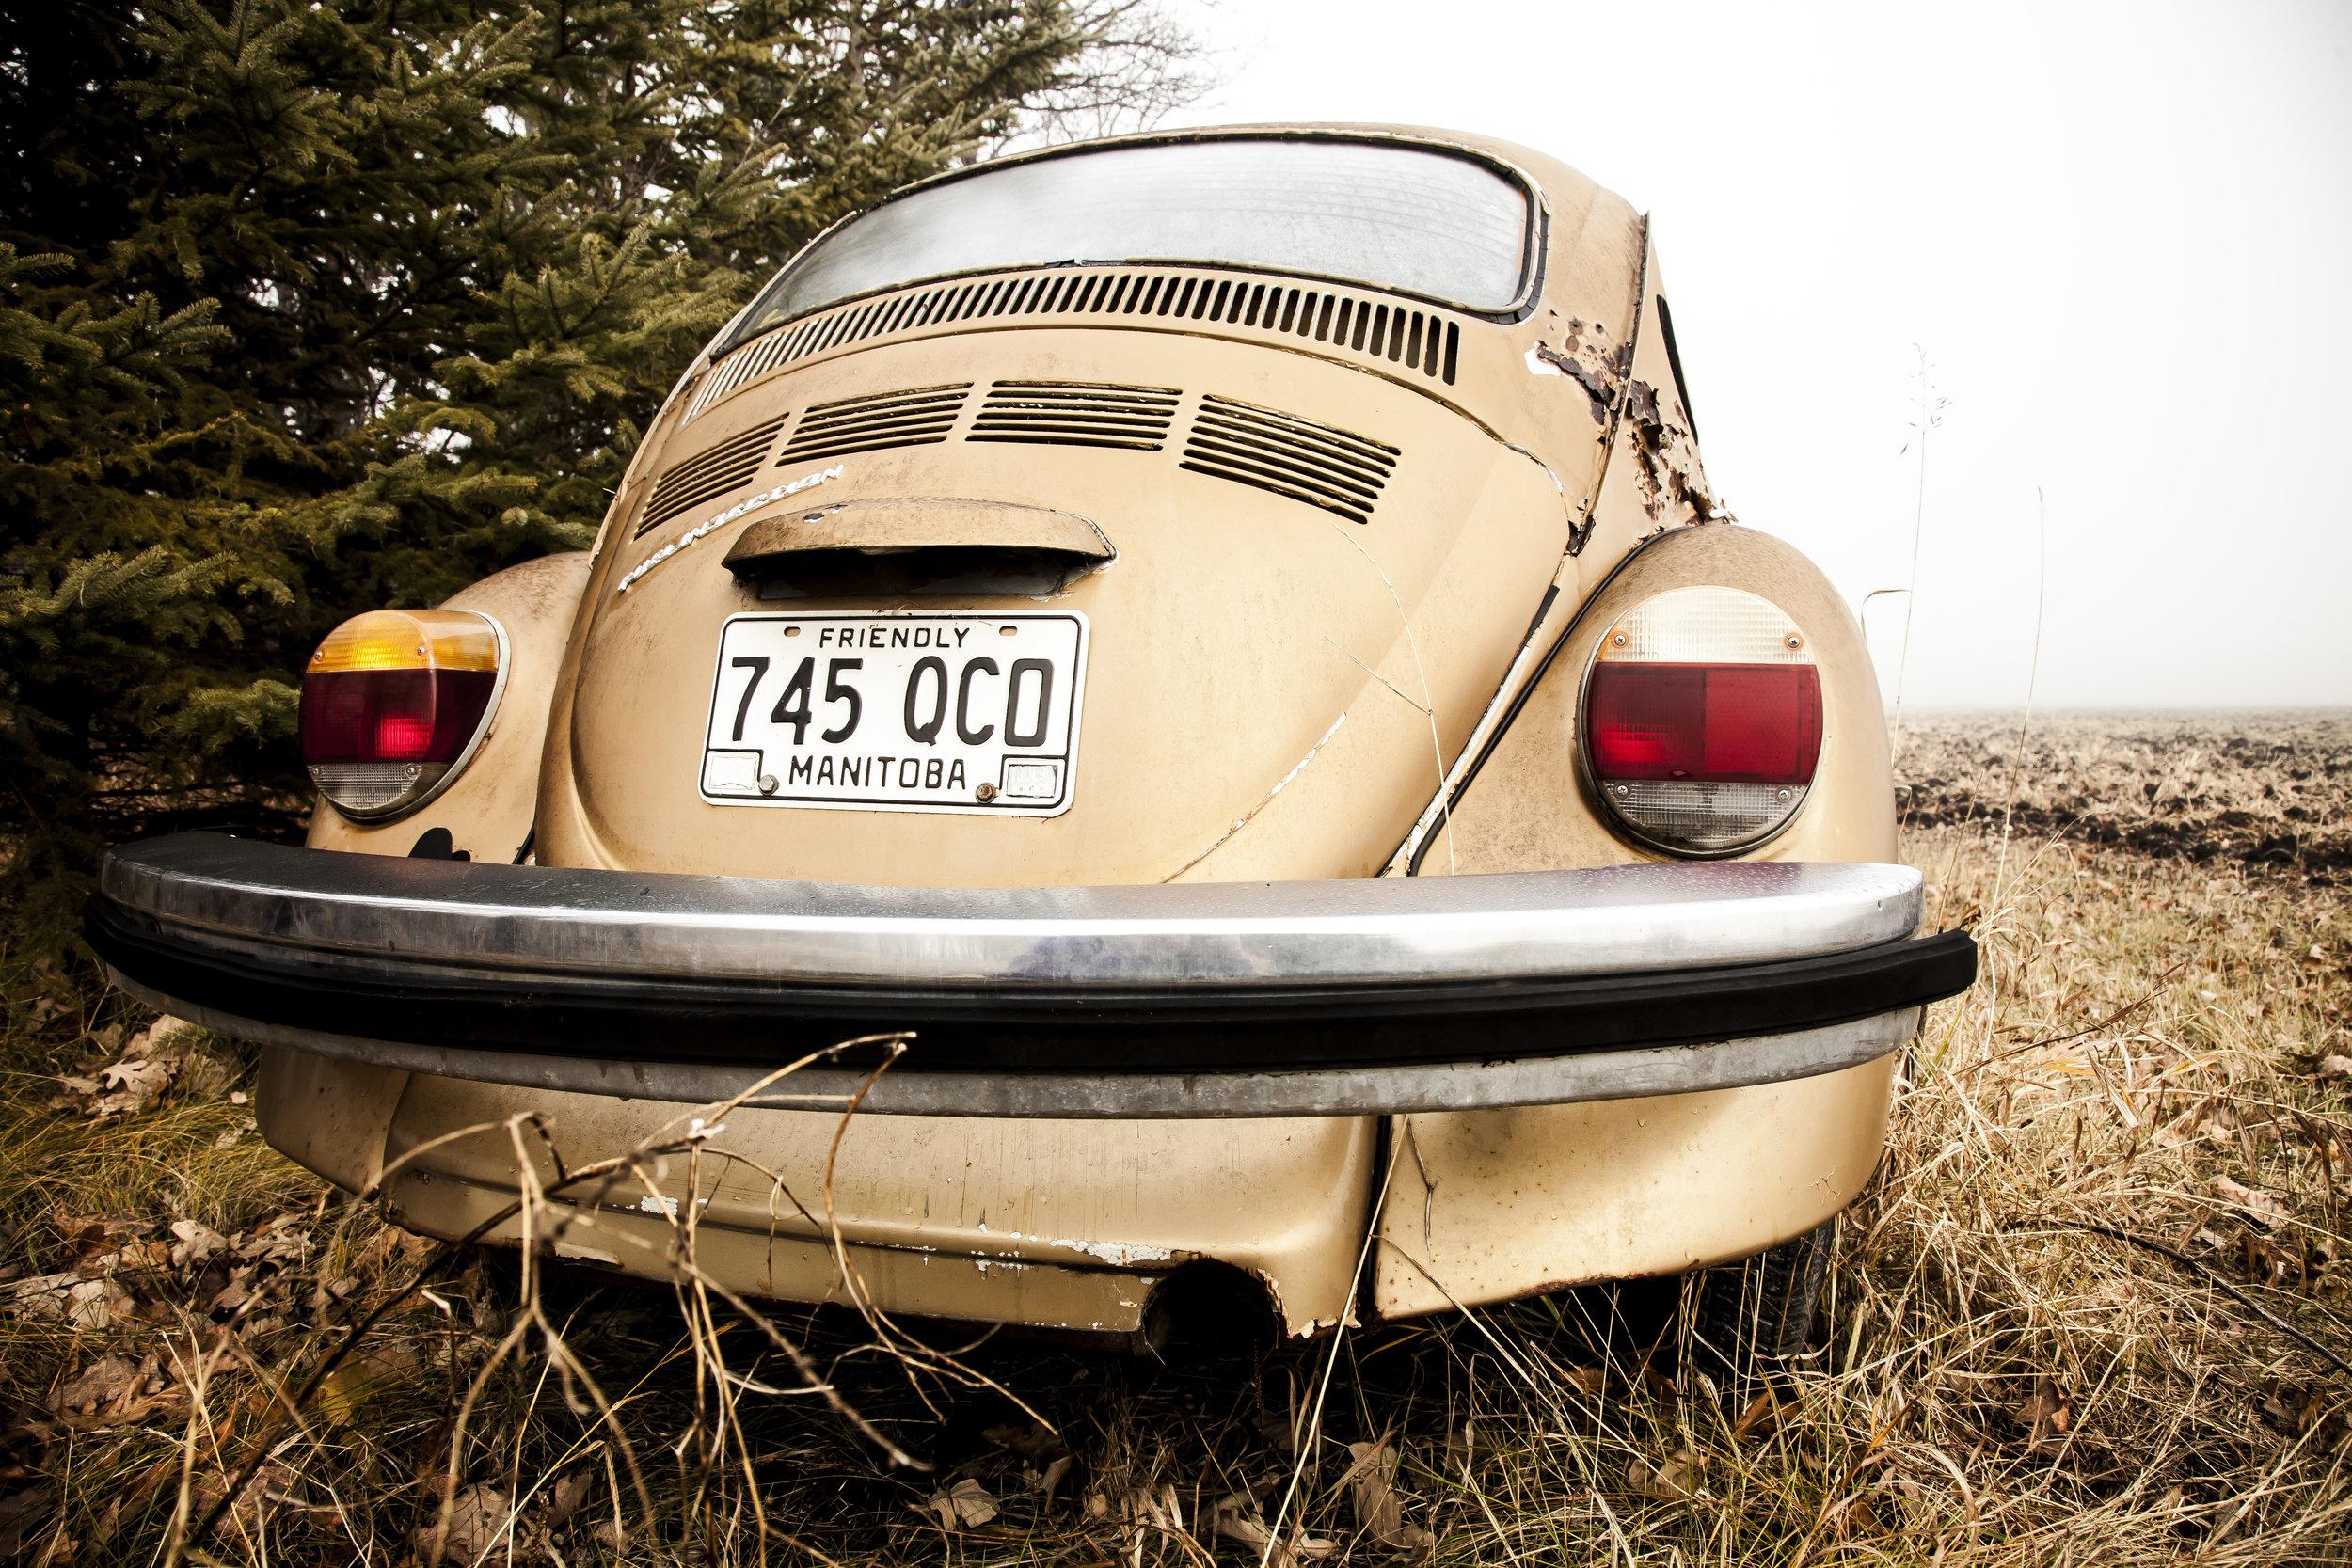 VW_GAGE_FLETHCER_5.jpg